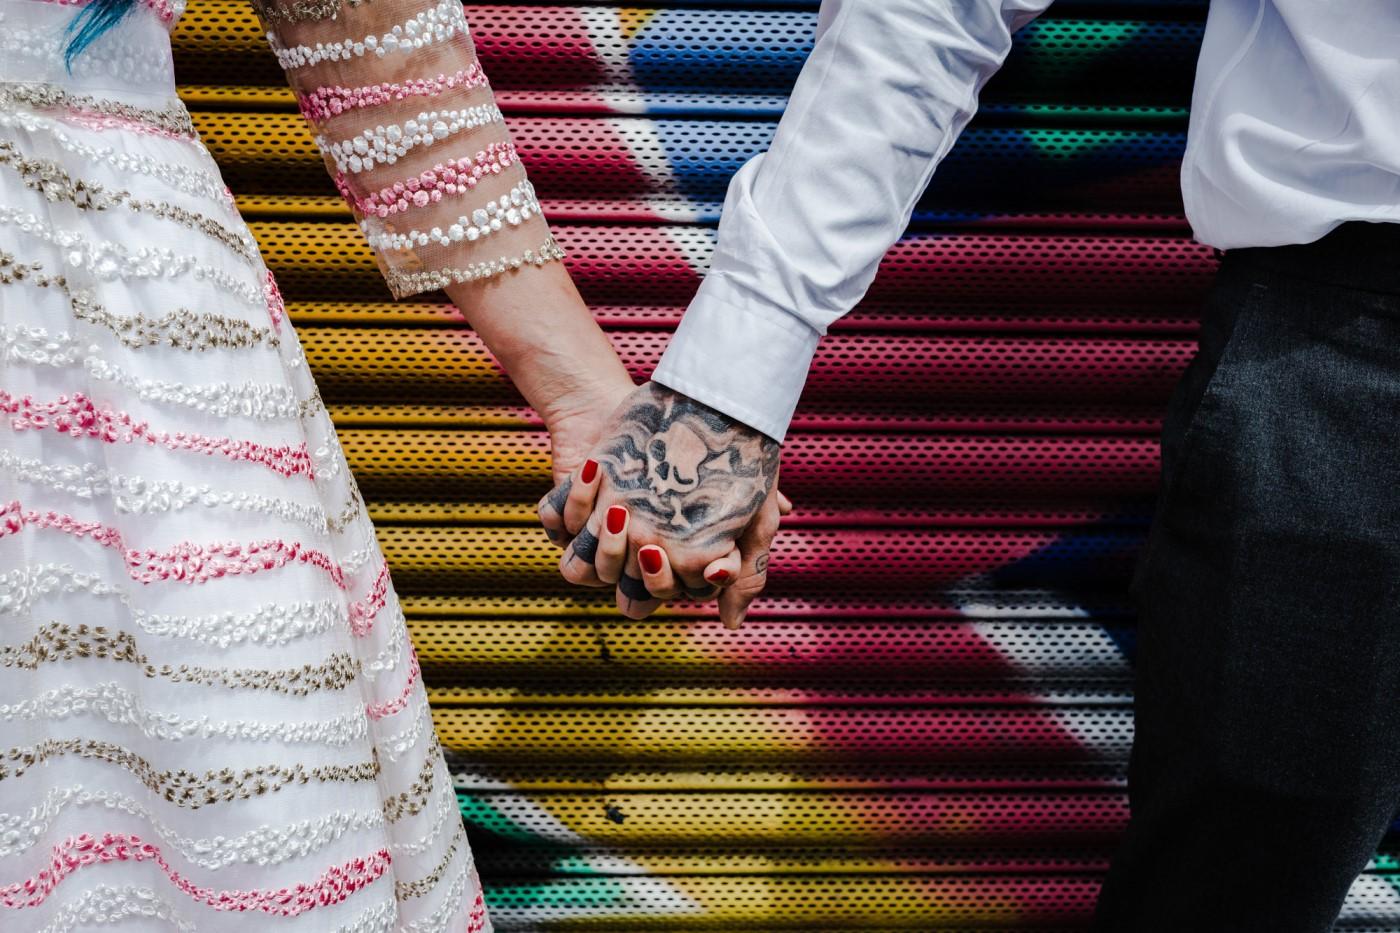 kirsty rockett photography - urban wedding against graffiti holding hands